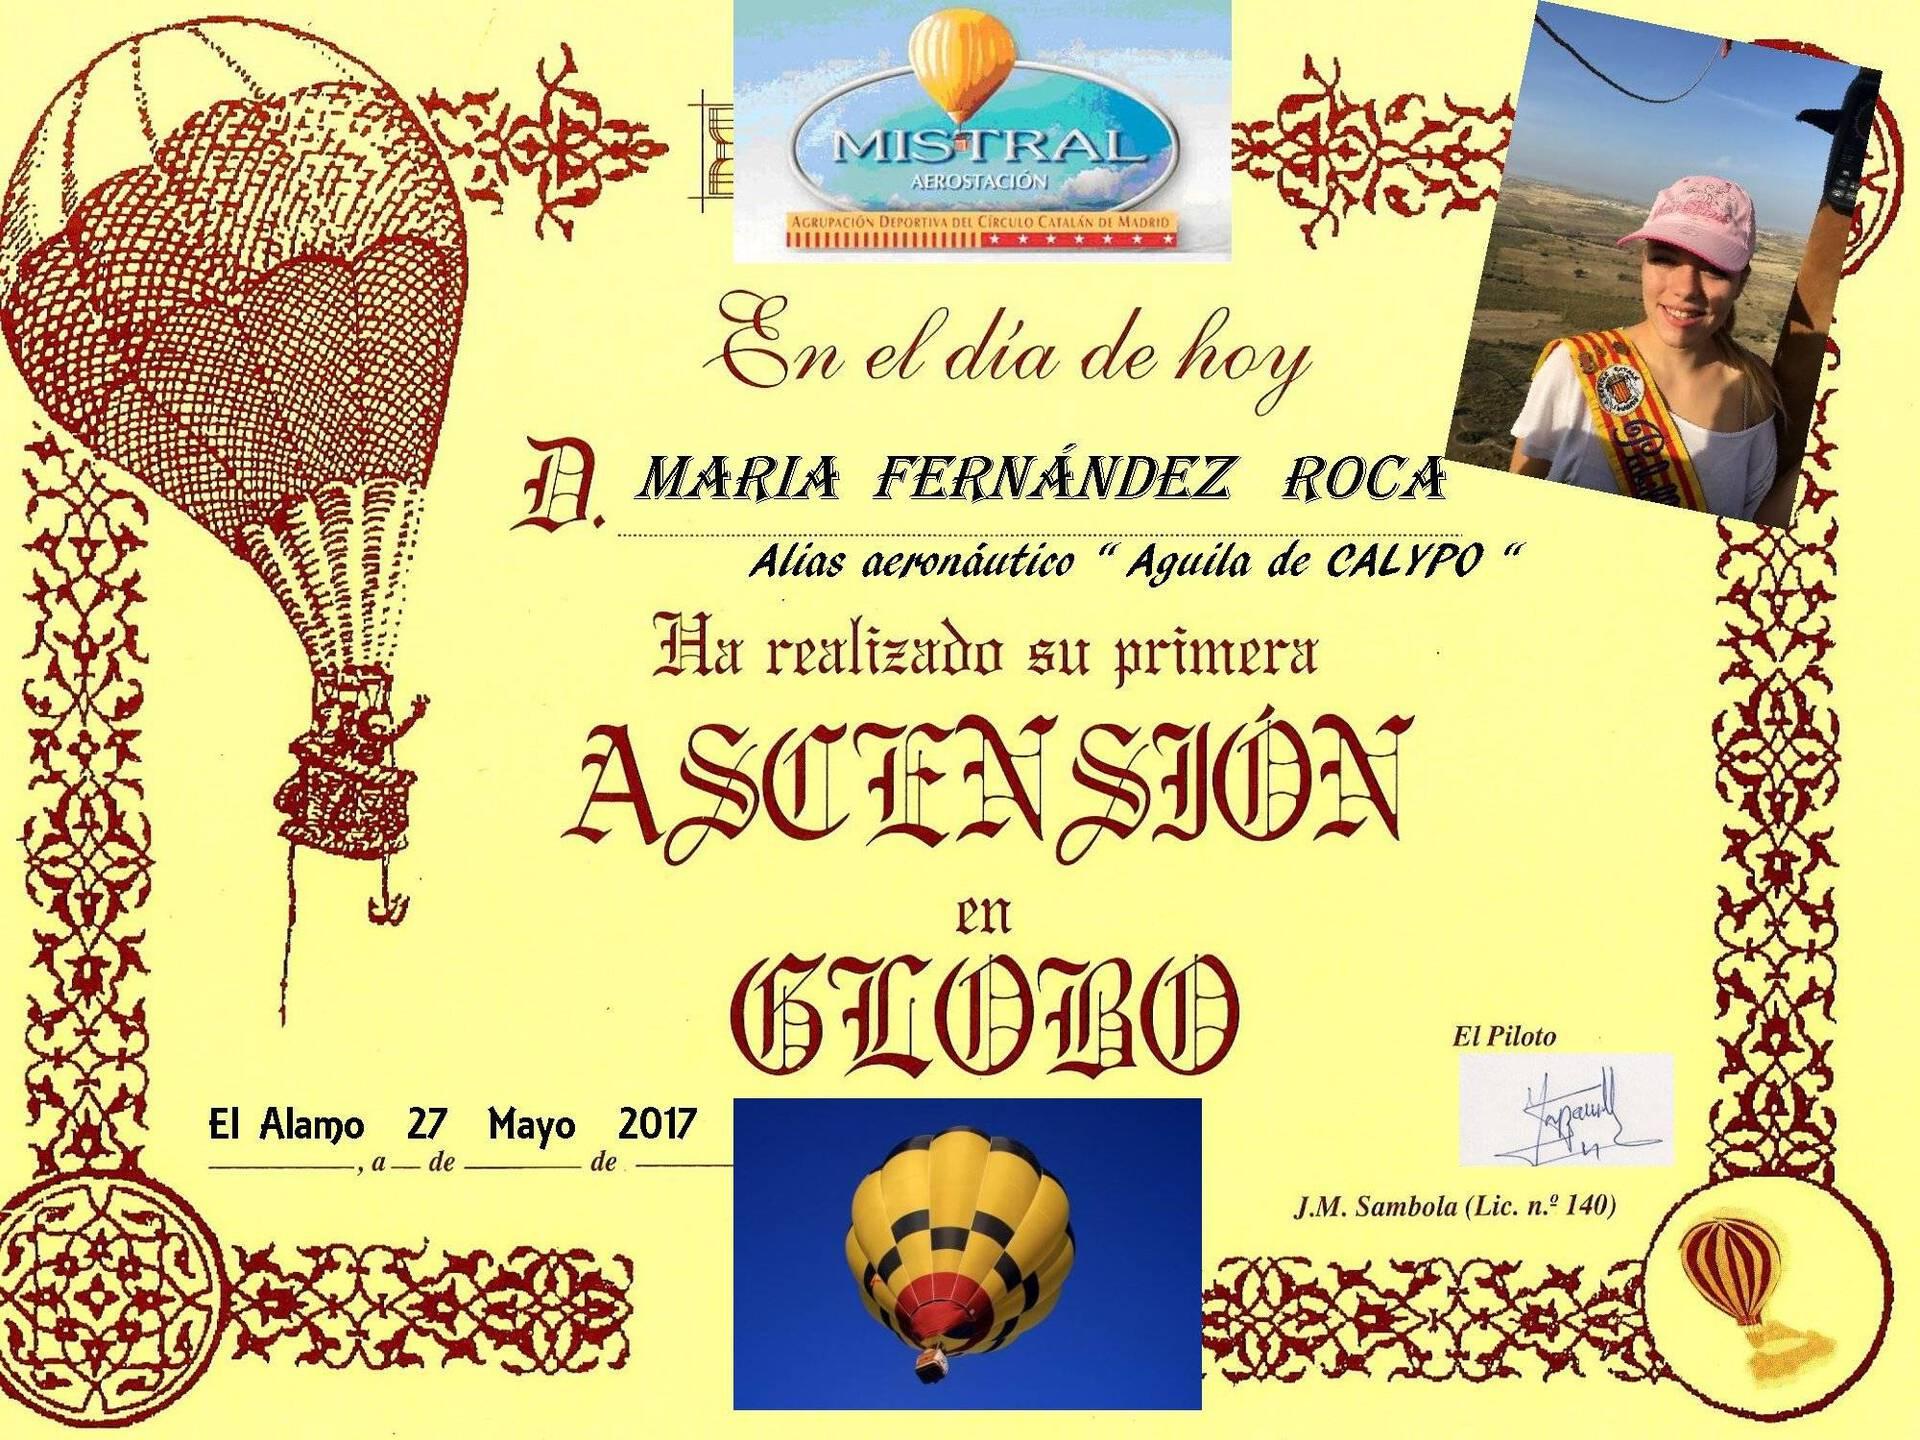 Pubilla 2017 - María Fernandez - Diploma vuelo